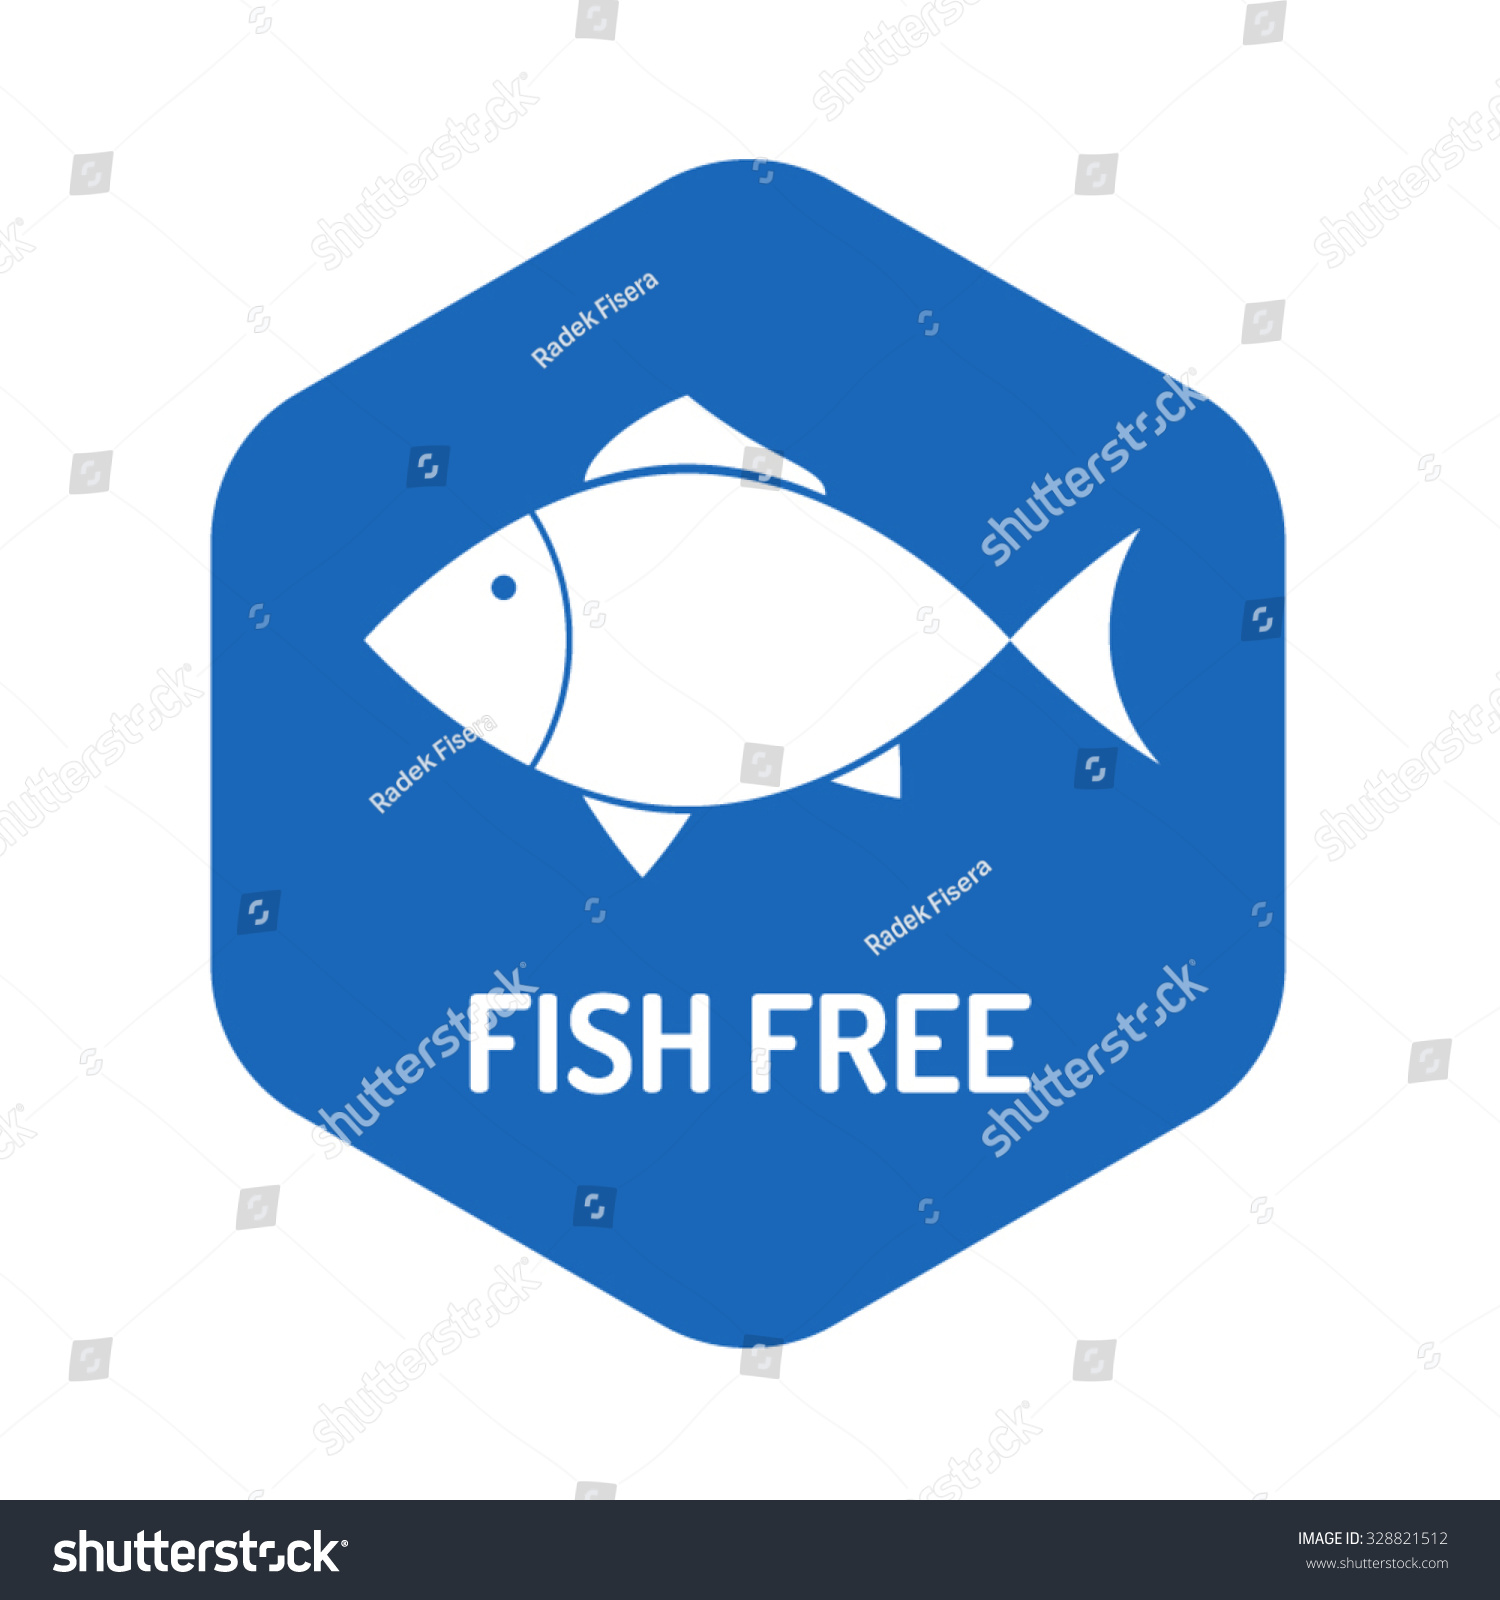 Fish Free Sign Icon No Fish Stock Photo Photo Vector Illustration